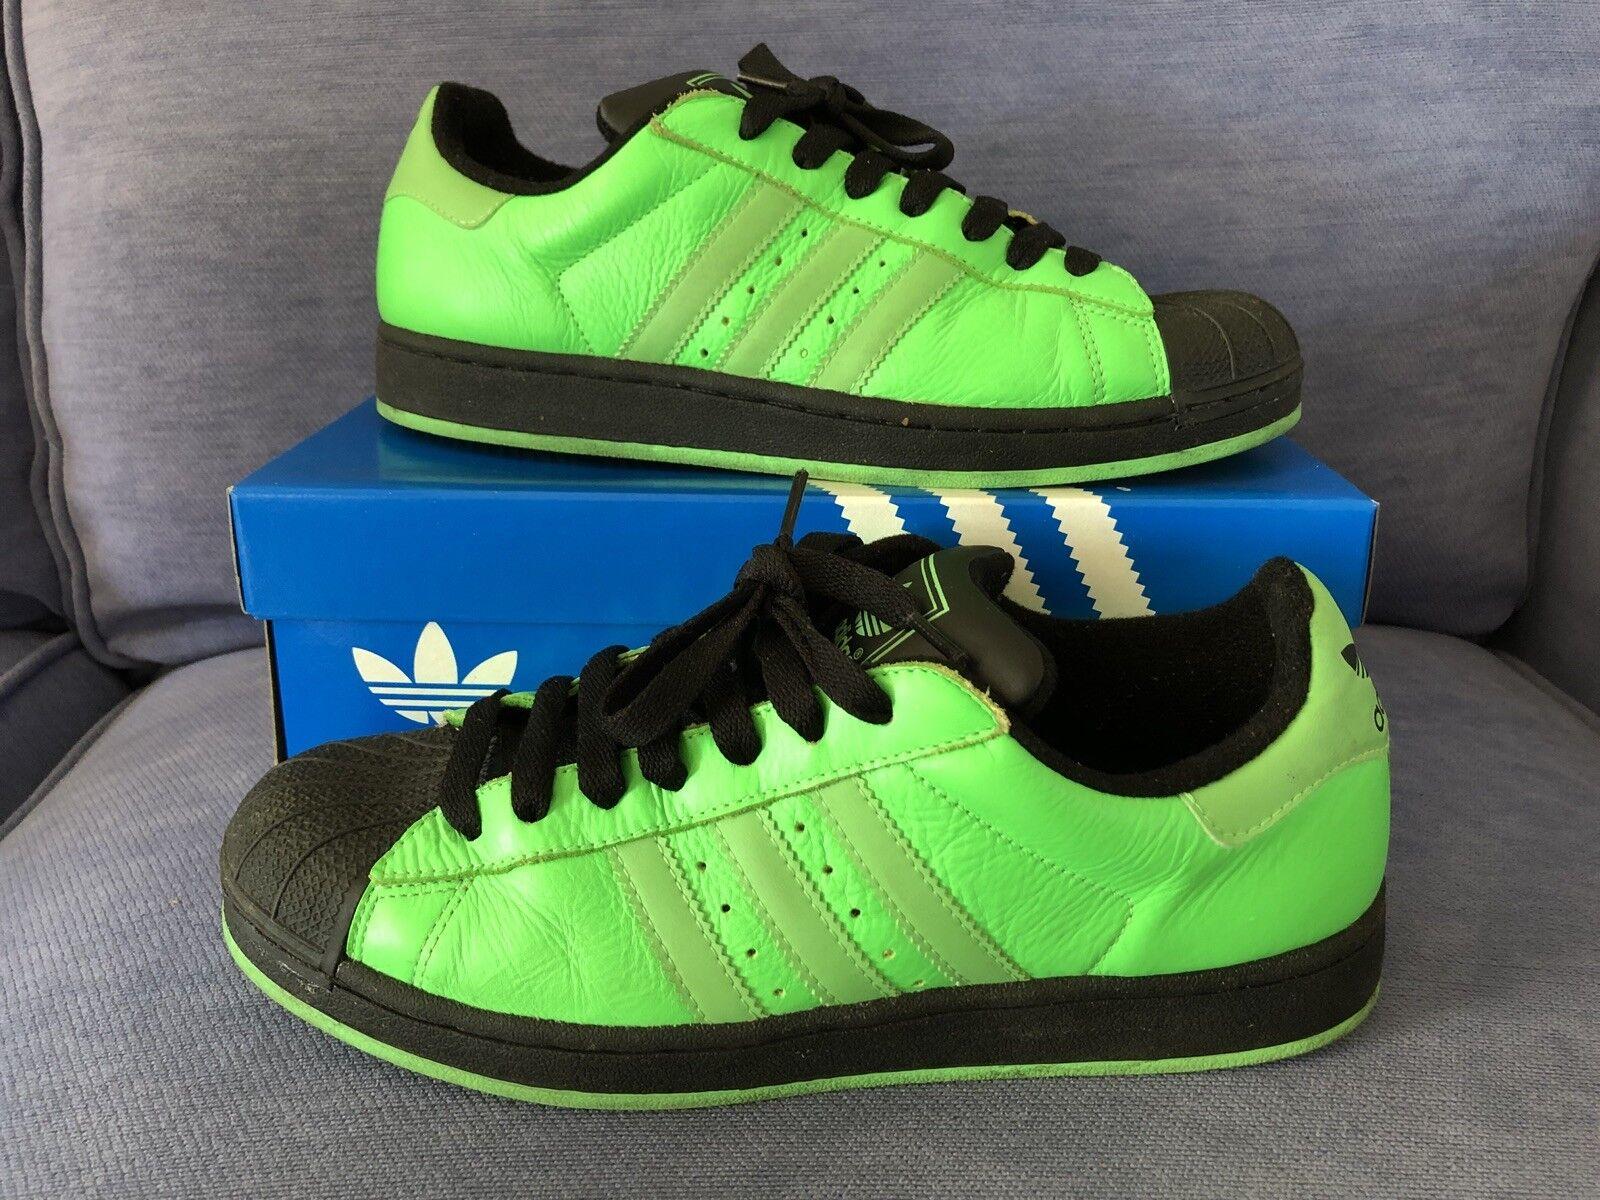 Original Trainer Homme Chaussure Spezial Adidas wfzE1f